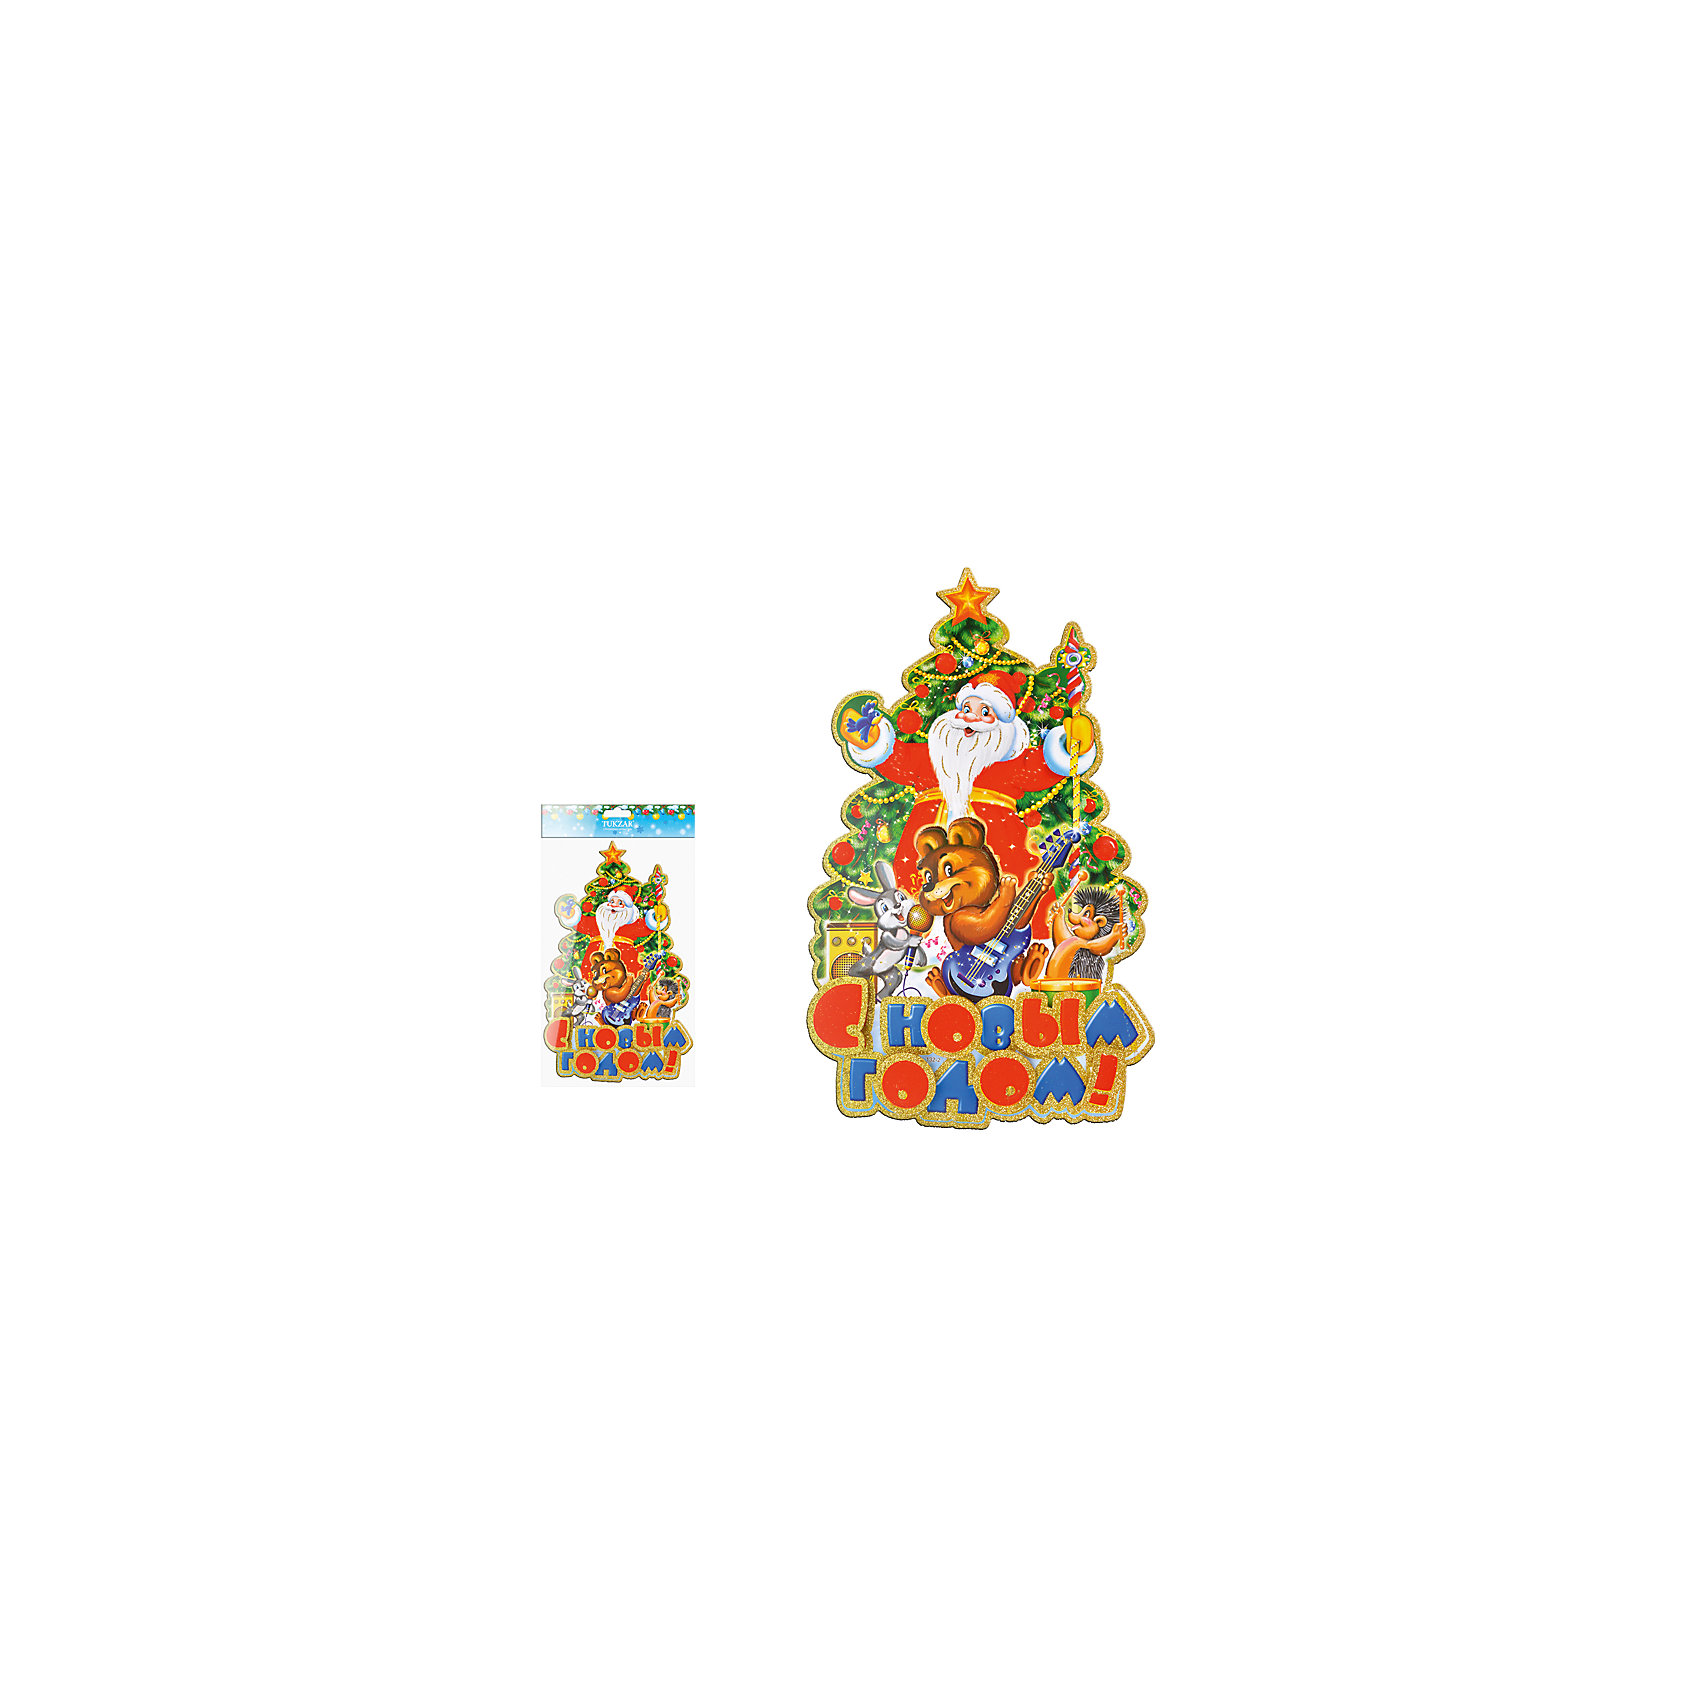 TUKZAR Панно бумажное Дед Мороз нурдквист с механический дед мороз